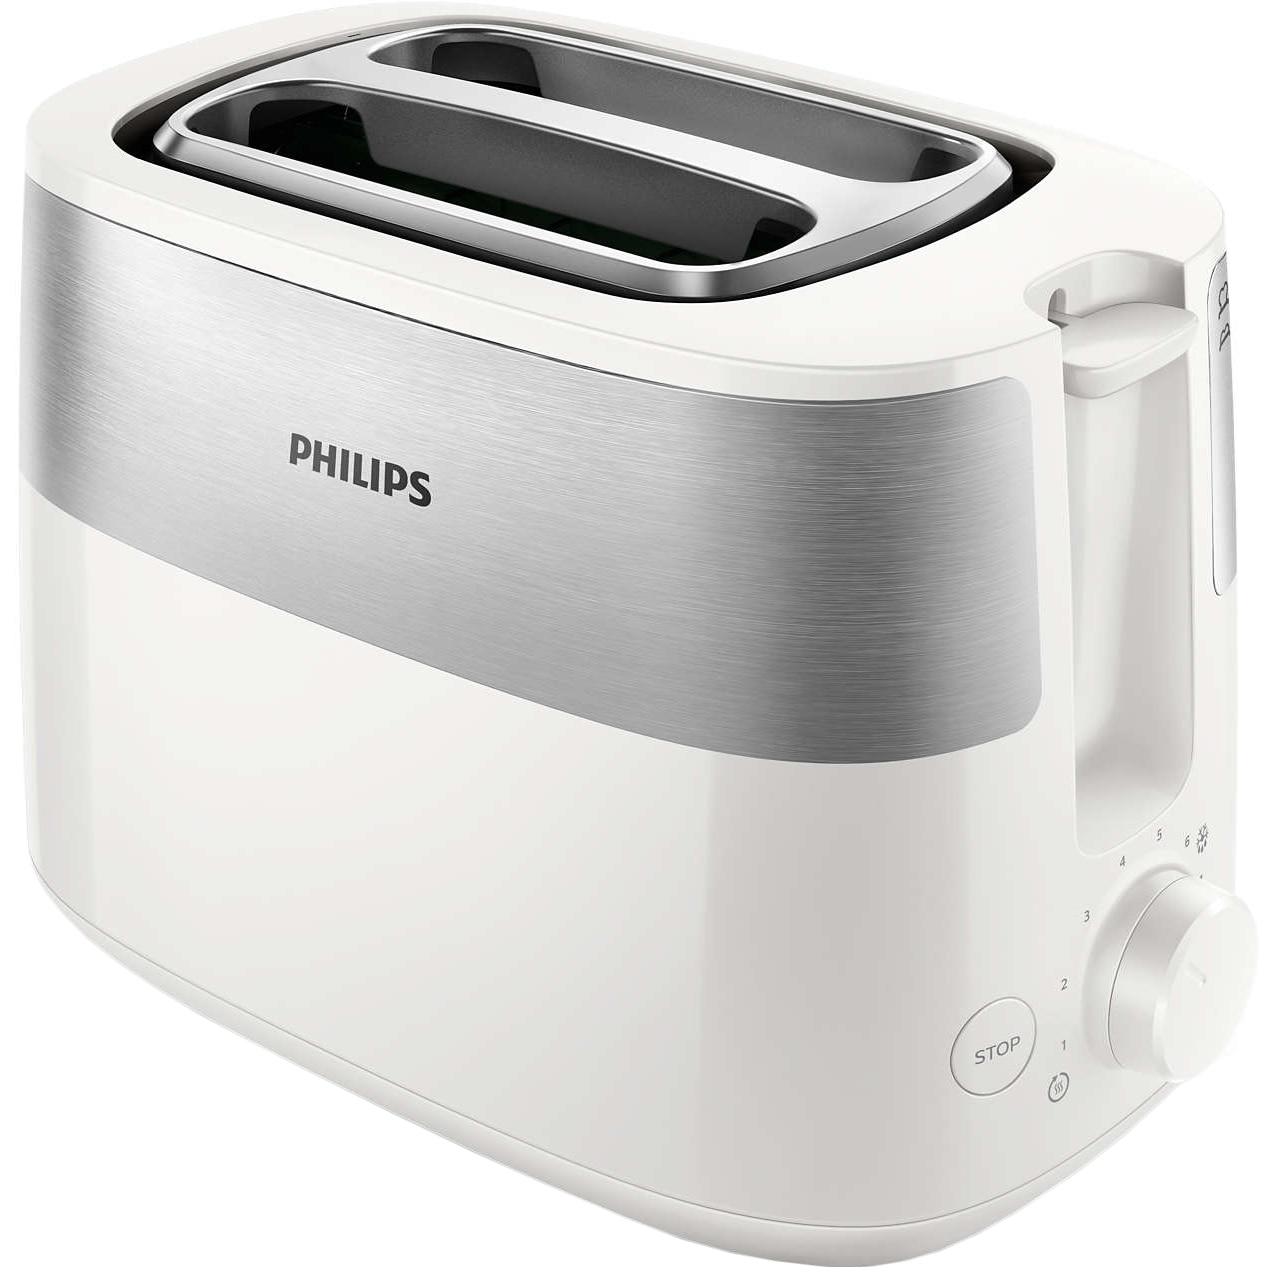 Fotografie Prajitor de paine PHILIPS HD2515/00, 830 W, 2 fante, functie dezghetare, Alb/Inox